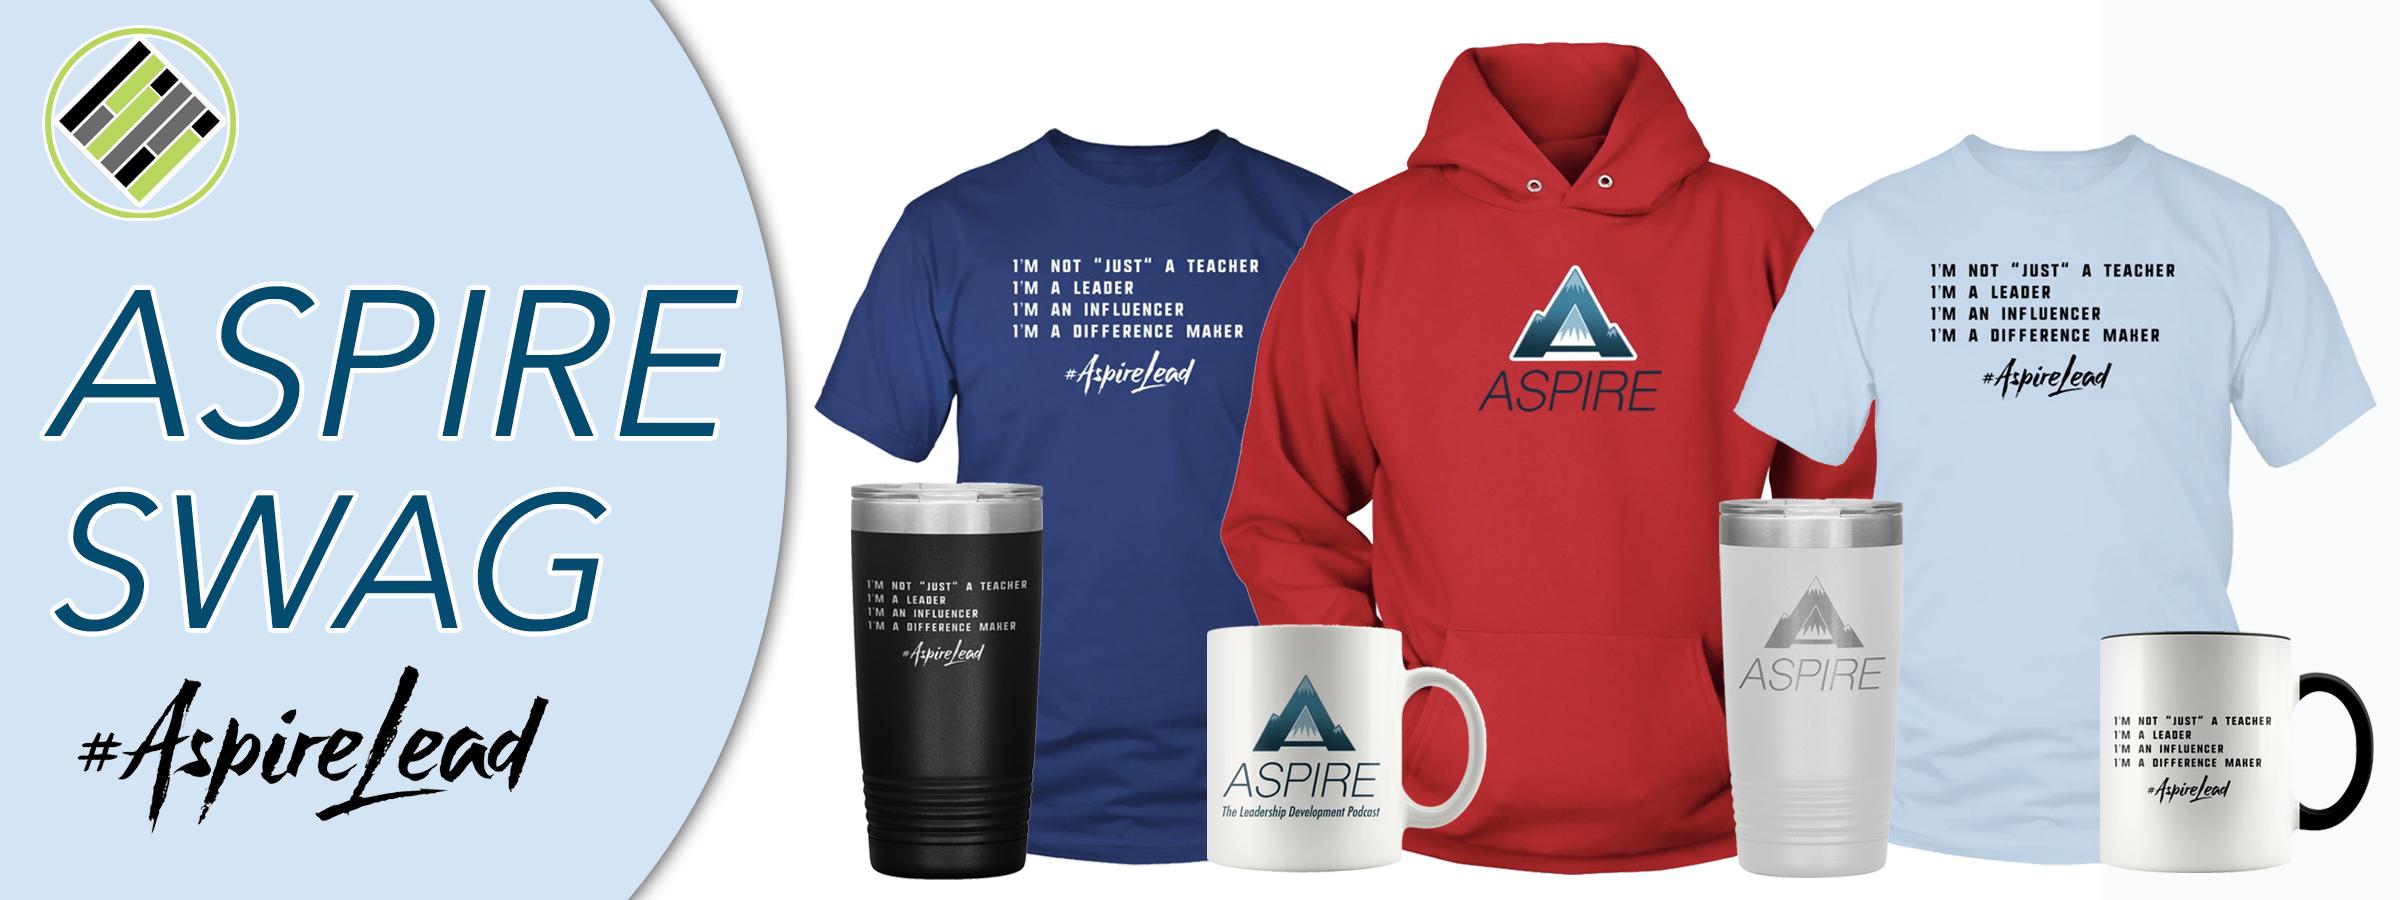 Aspire Swag, Teach Better Team, Joshua Stamper, Aspire: The Leadership Development Podcast